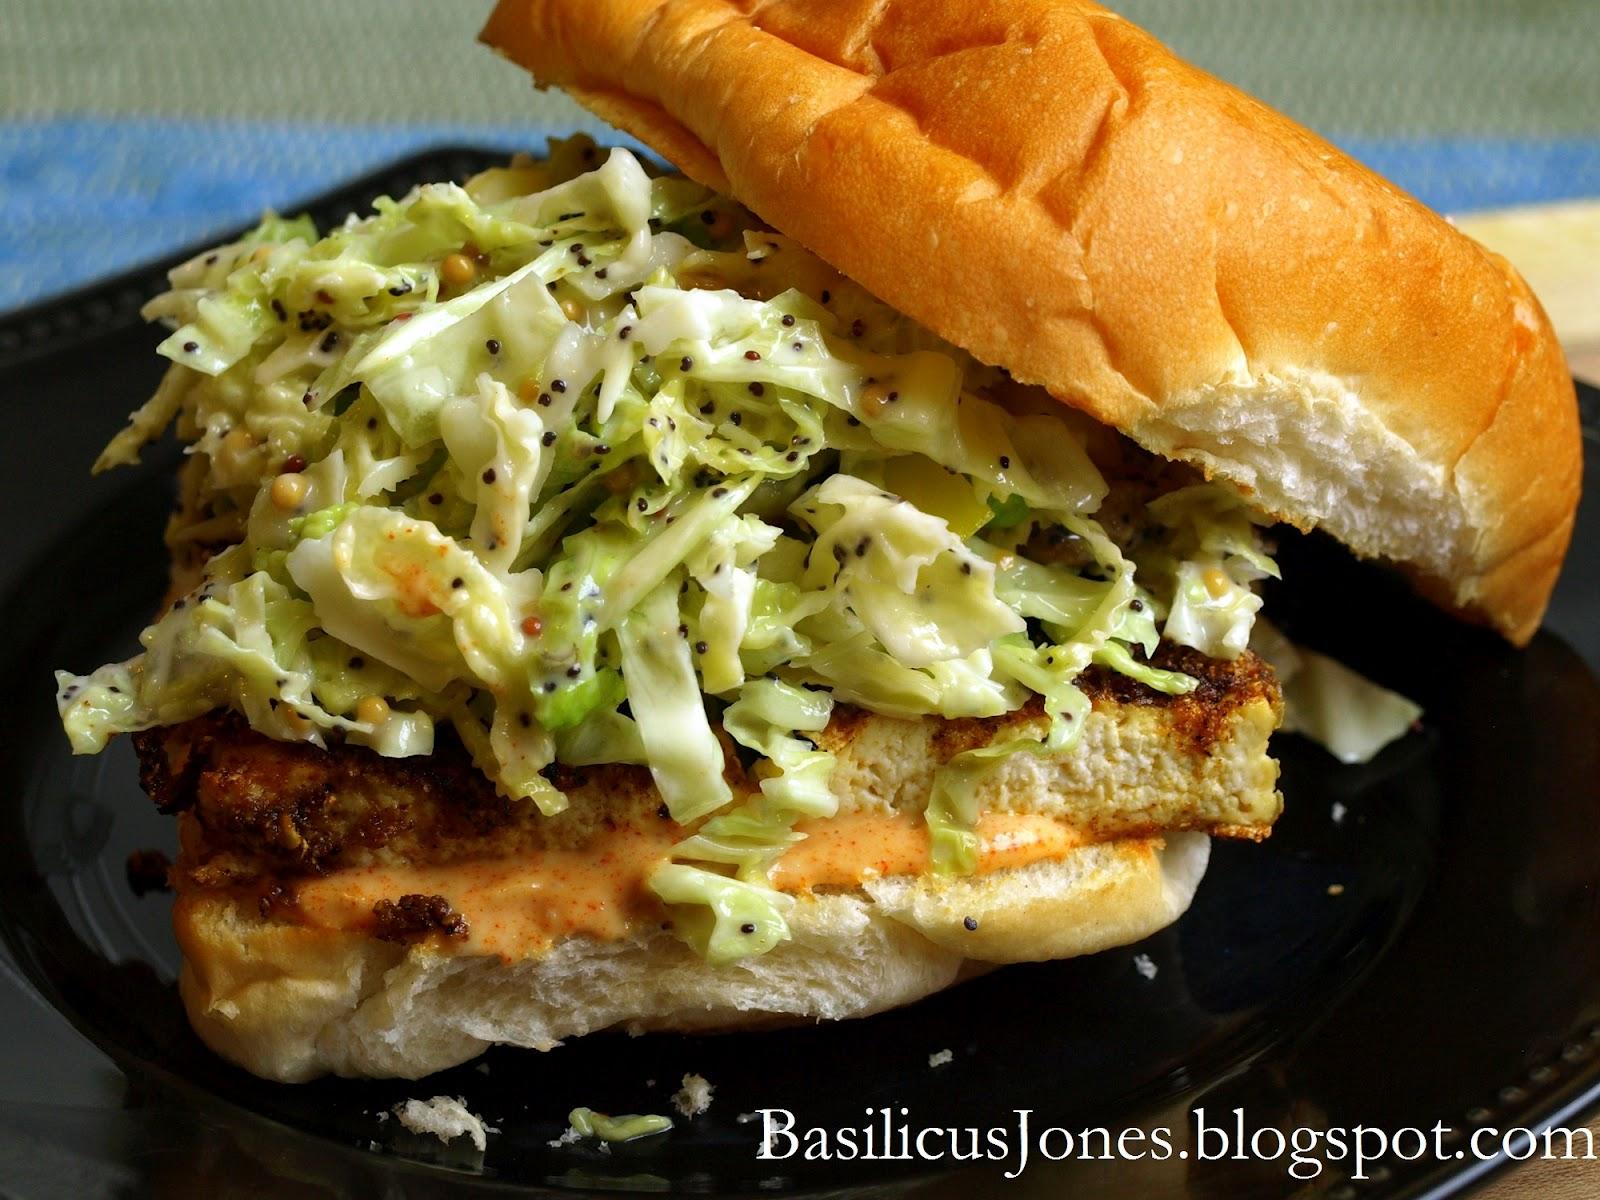 Grilled Tofu Sandwiches with Slaw | BasilicusJones